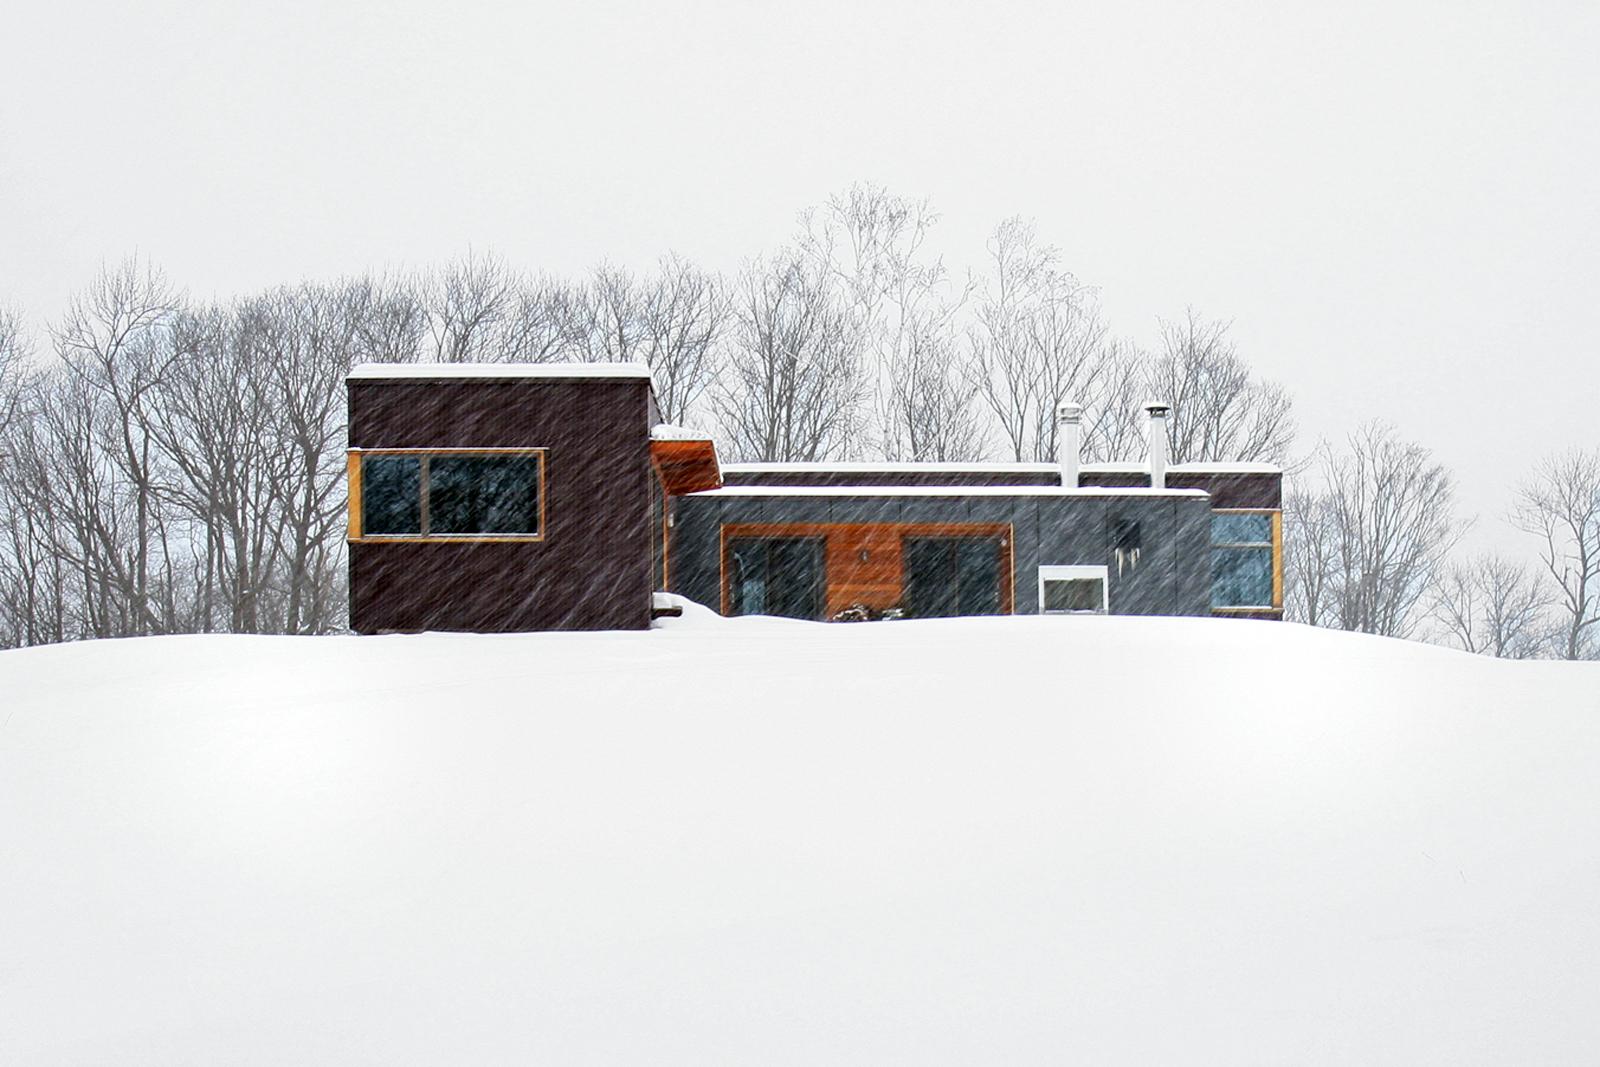 12-res4-resolution-4-architecture-modern-modular-home-prefab-house-vermont-cabin-exterior.jpg